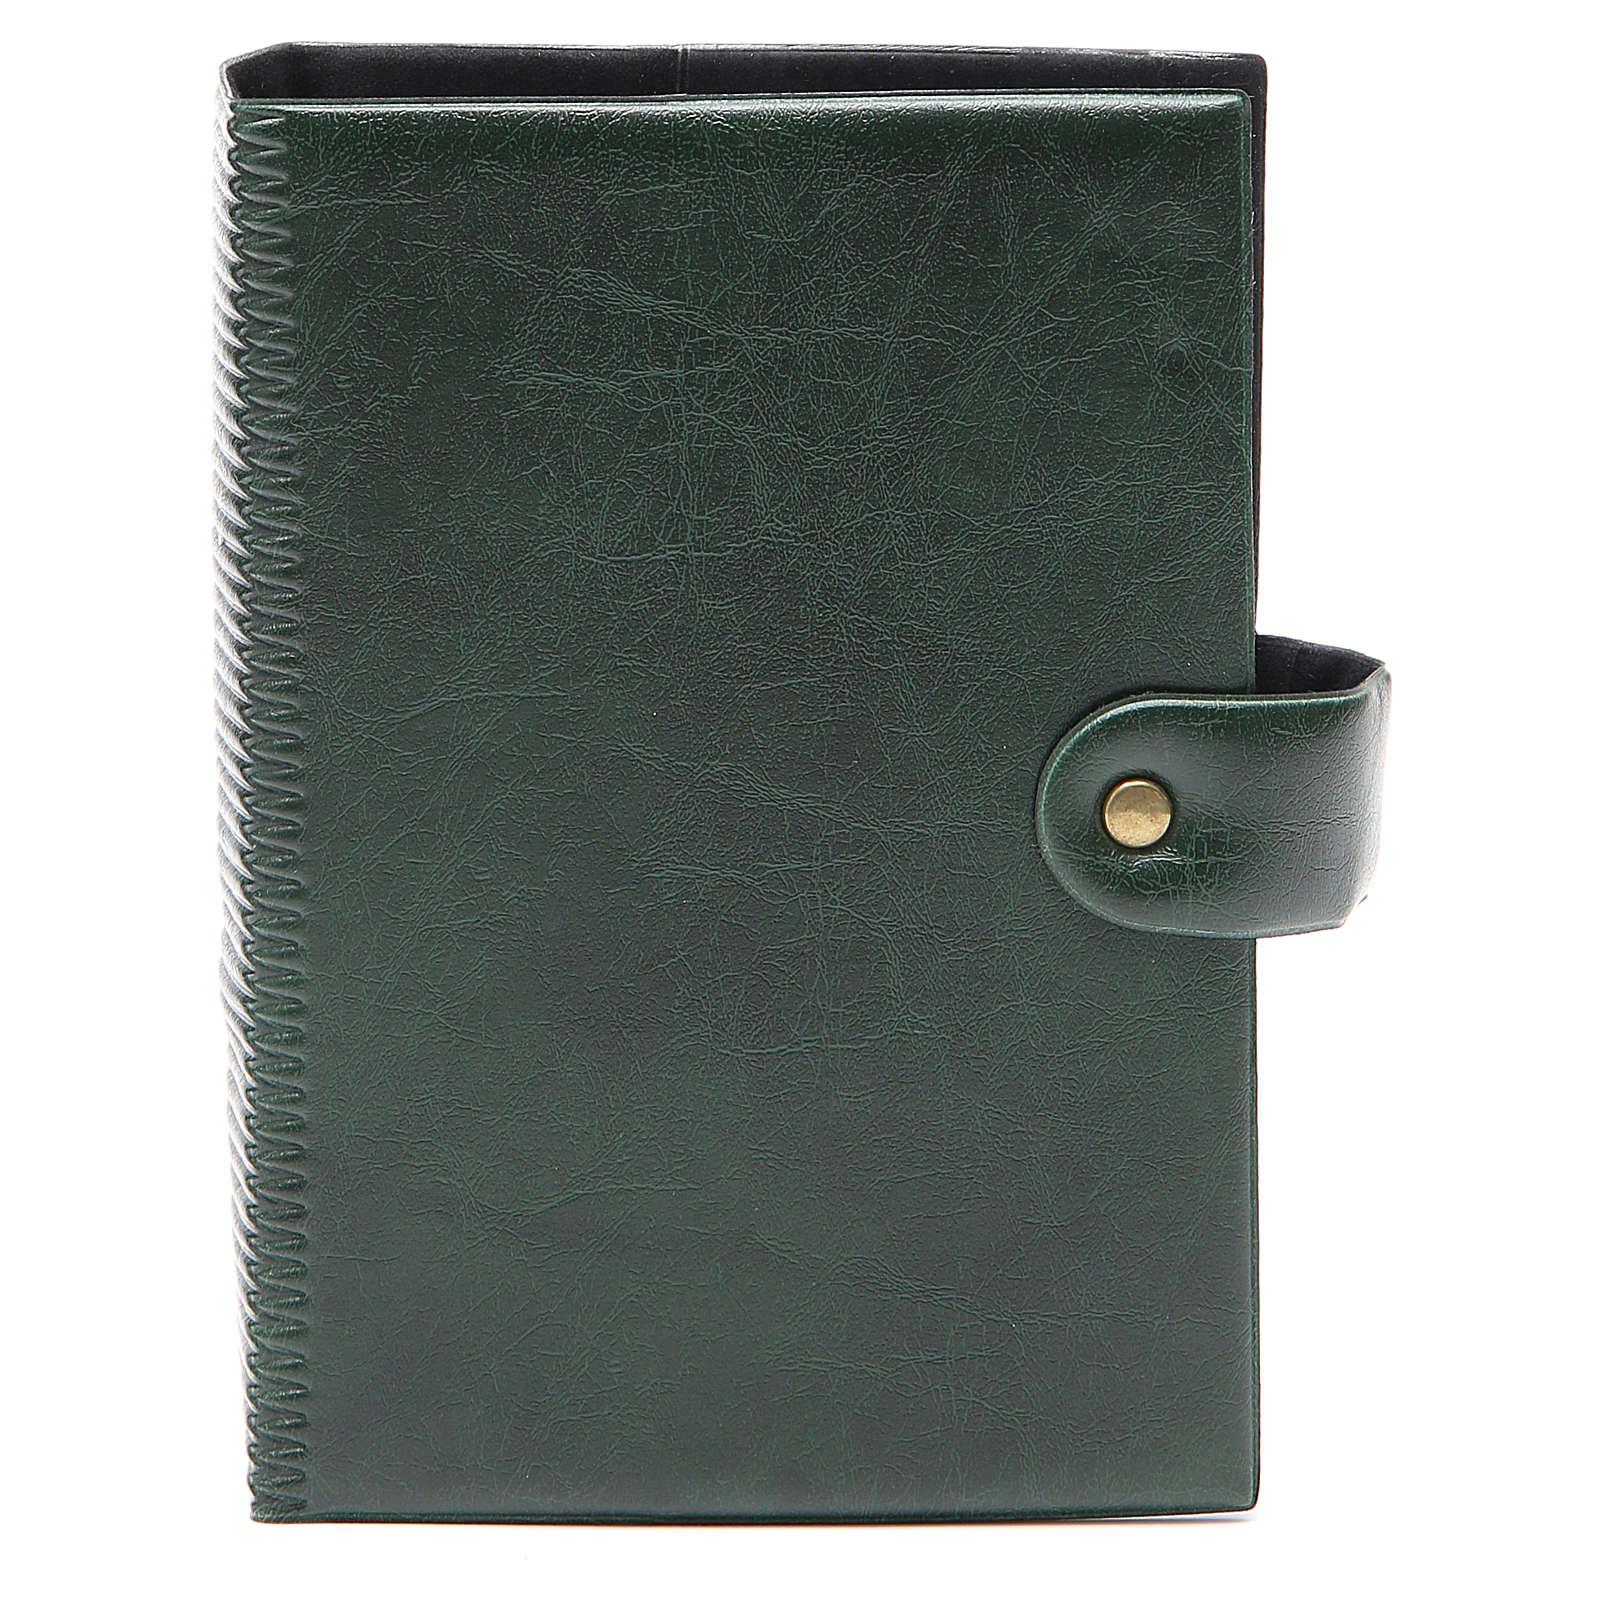 STOCK Custodia Bibbia Gerusalemme similpelle verde 4